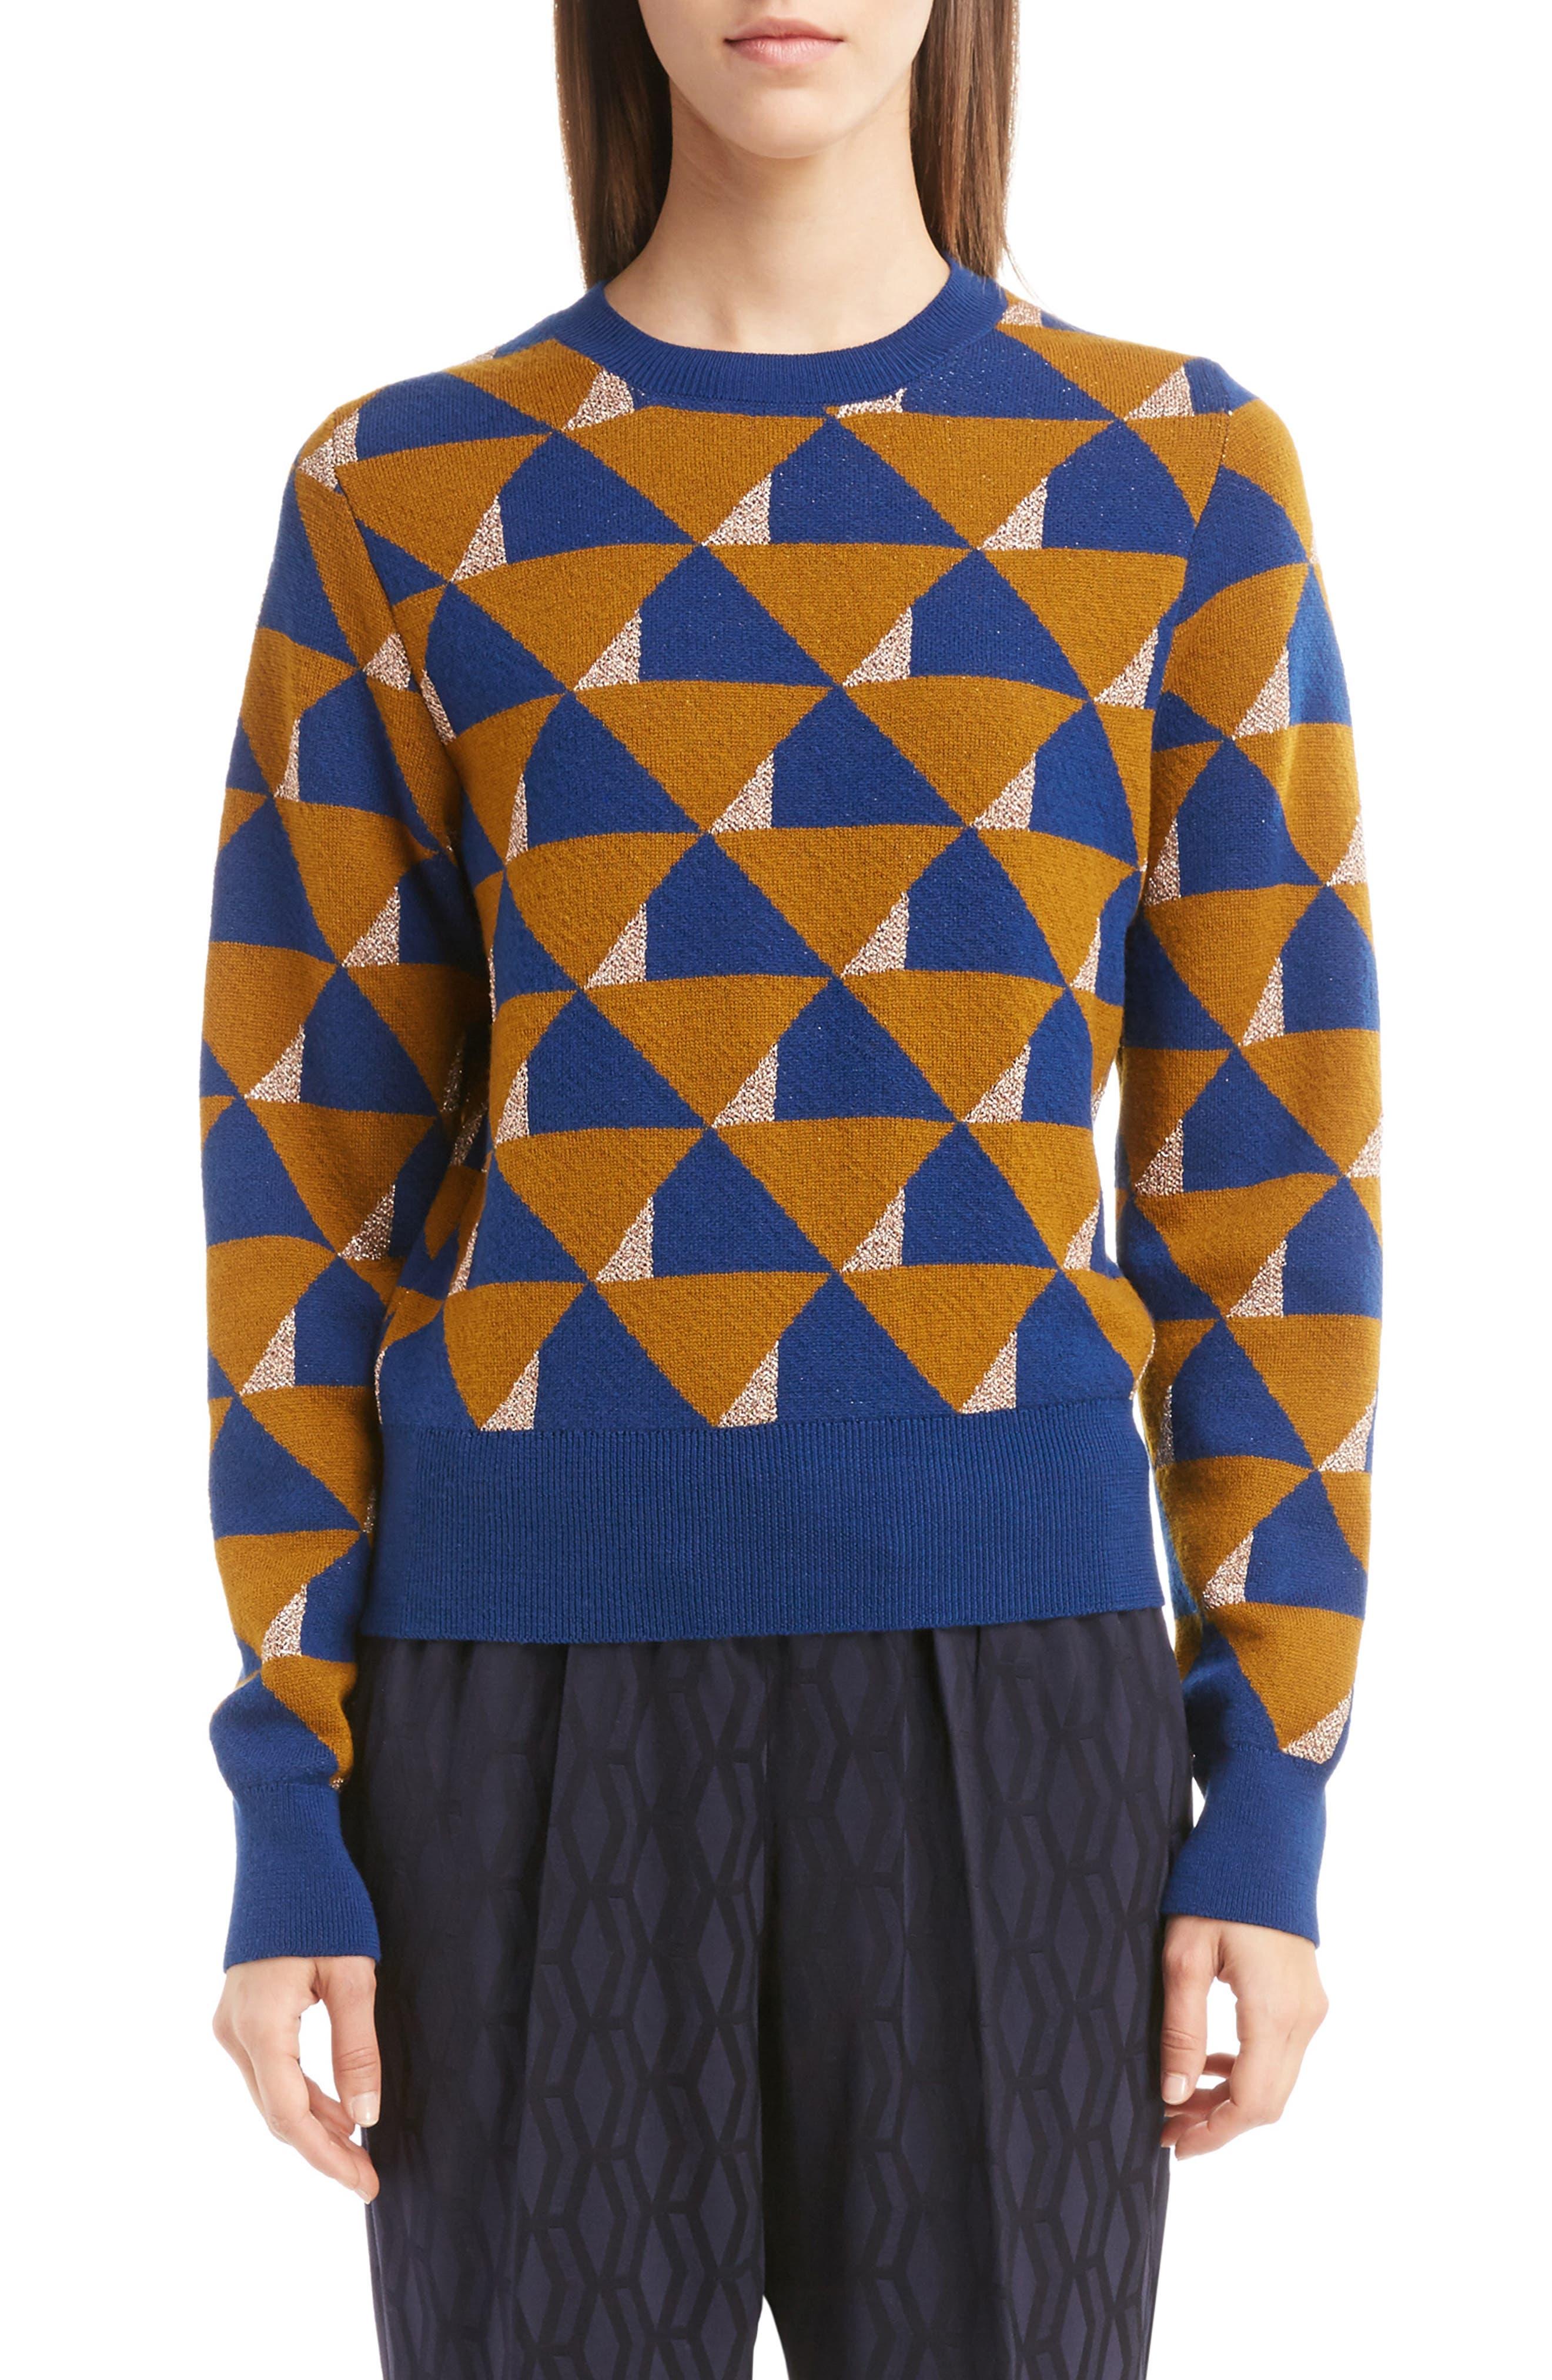 Graphic Knit Merino Wool Sweater,                         Main,                         color, Ocra